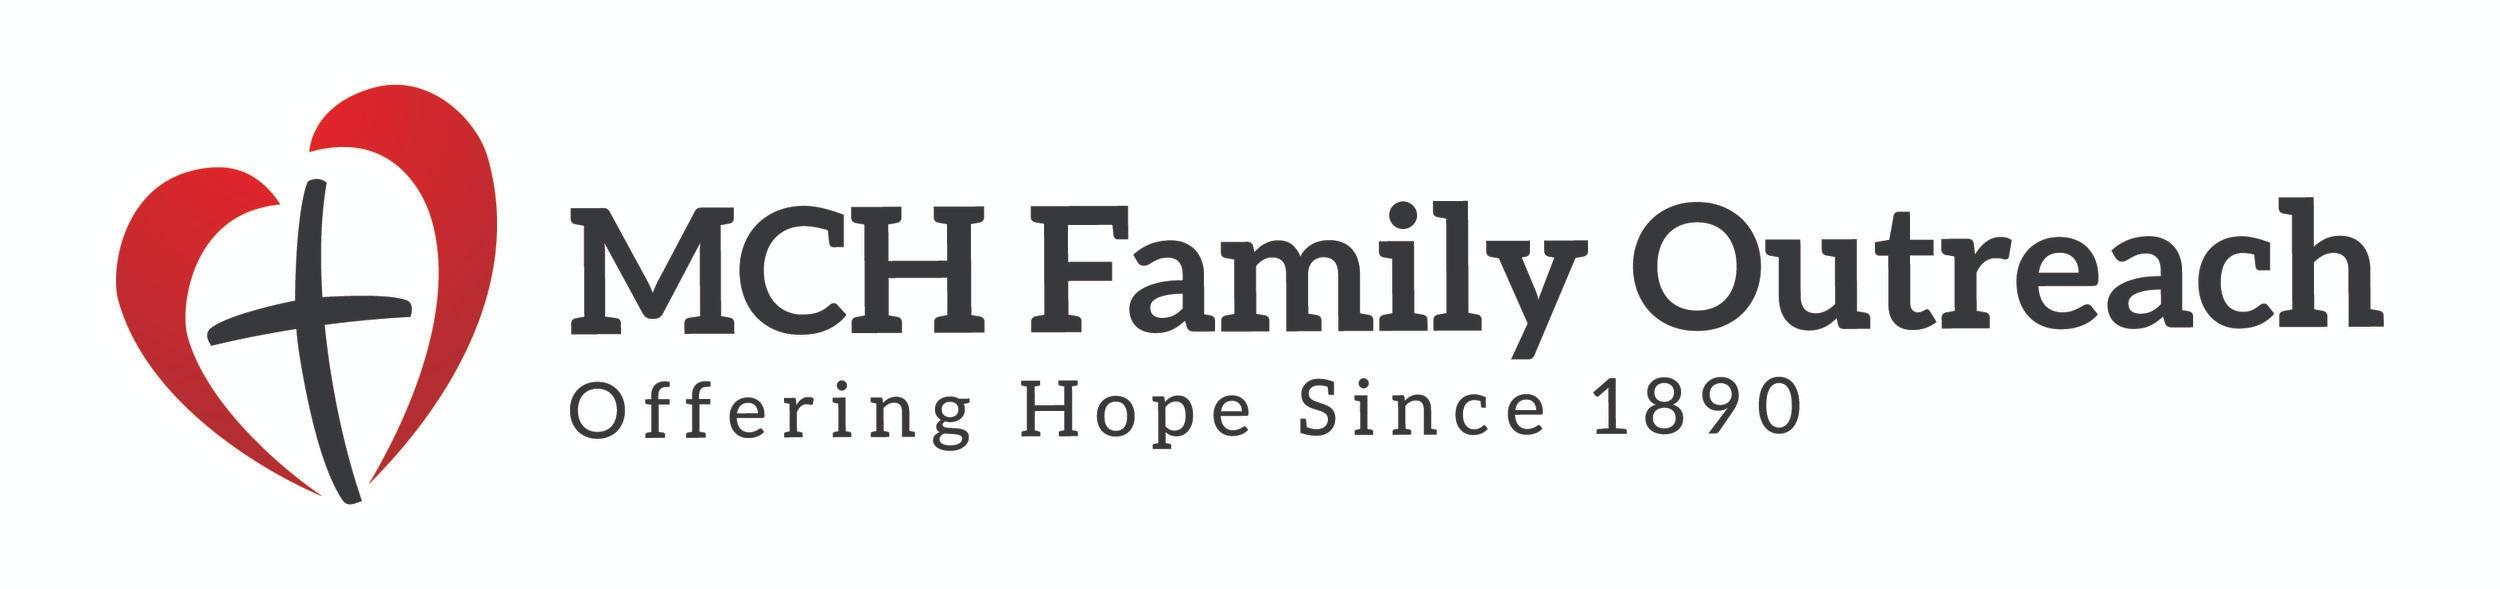 MCH+Logo.jpg